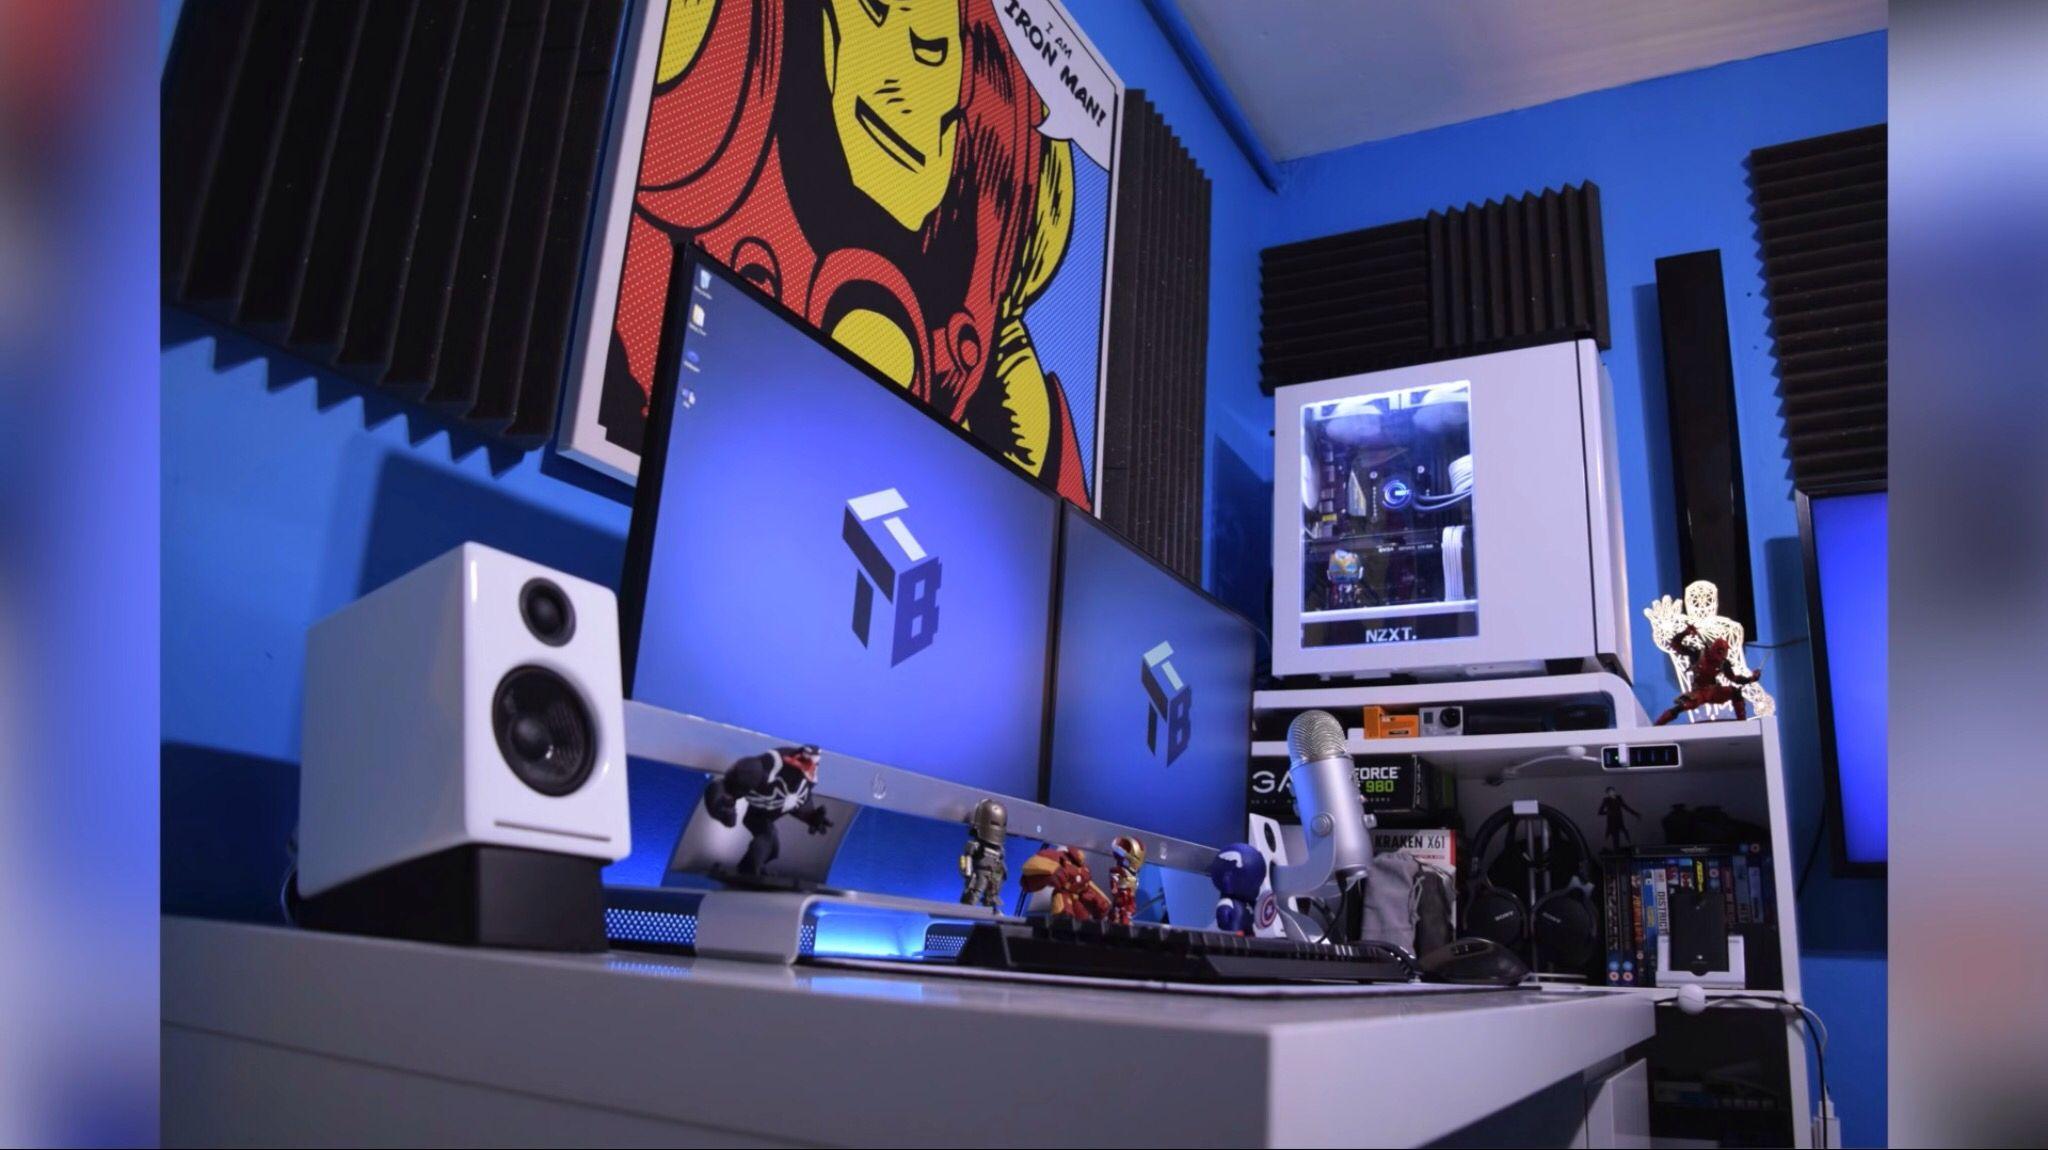 Gamingyoutube Superhero Theme Setup